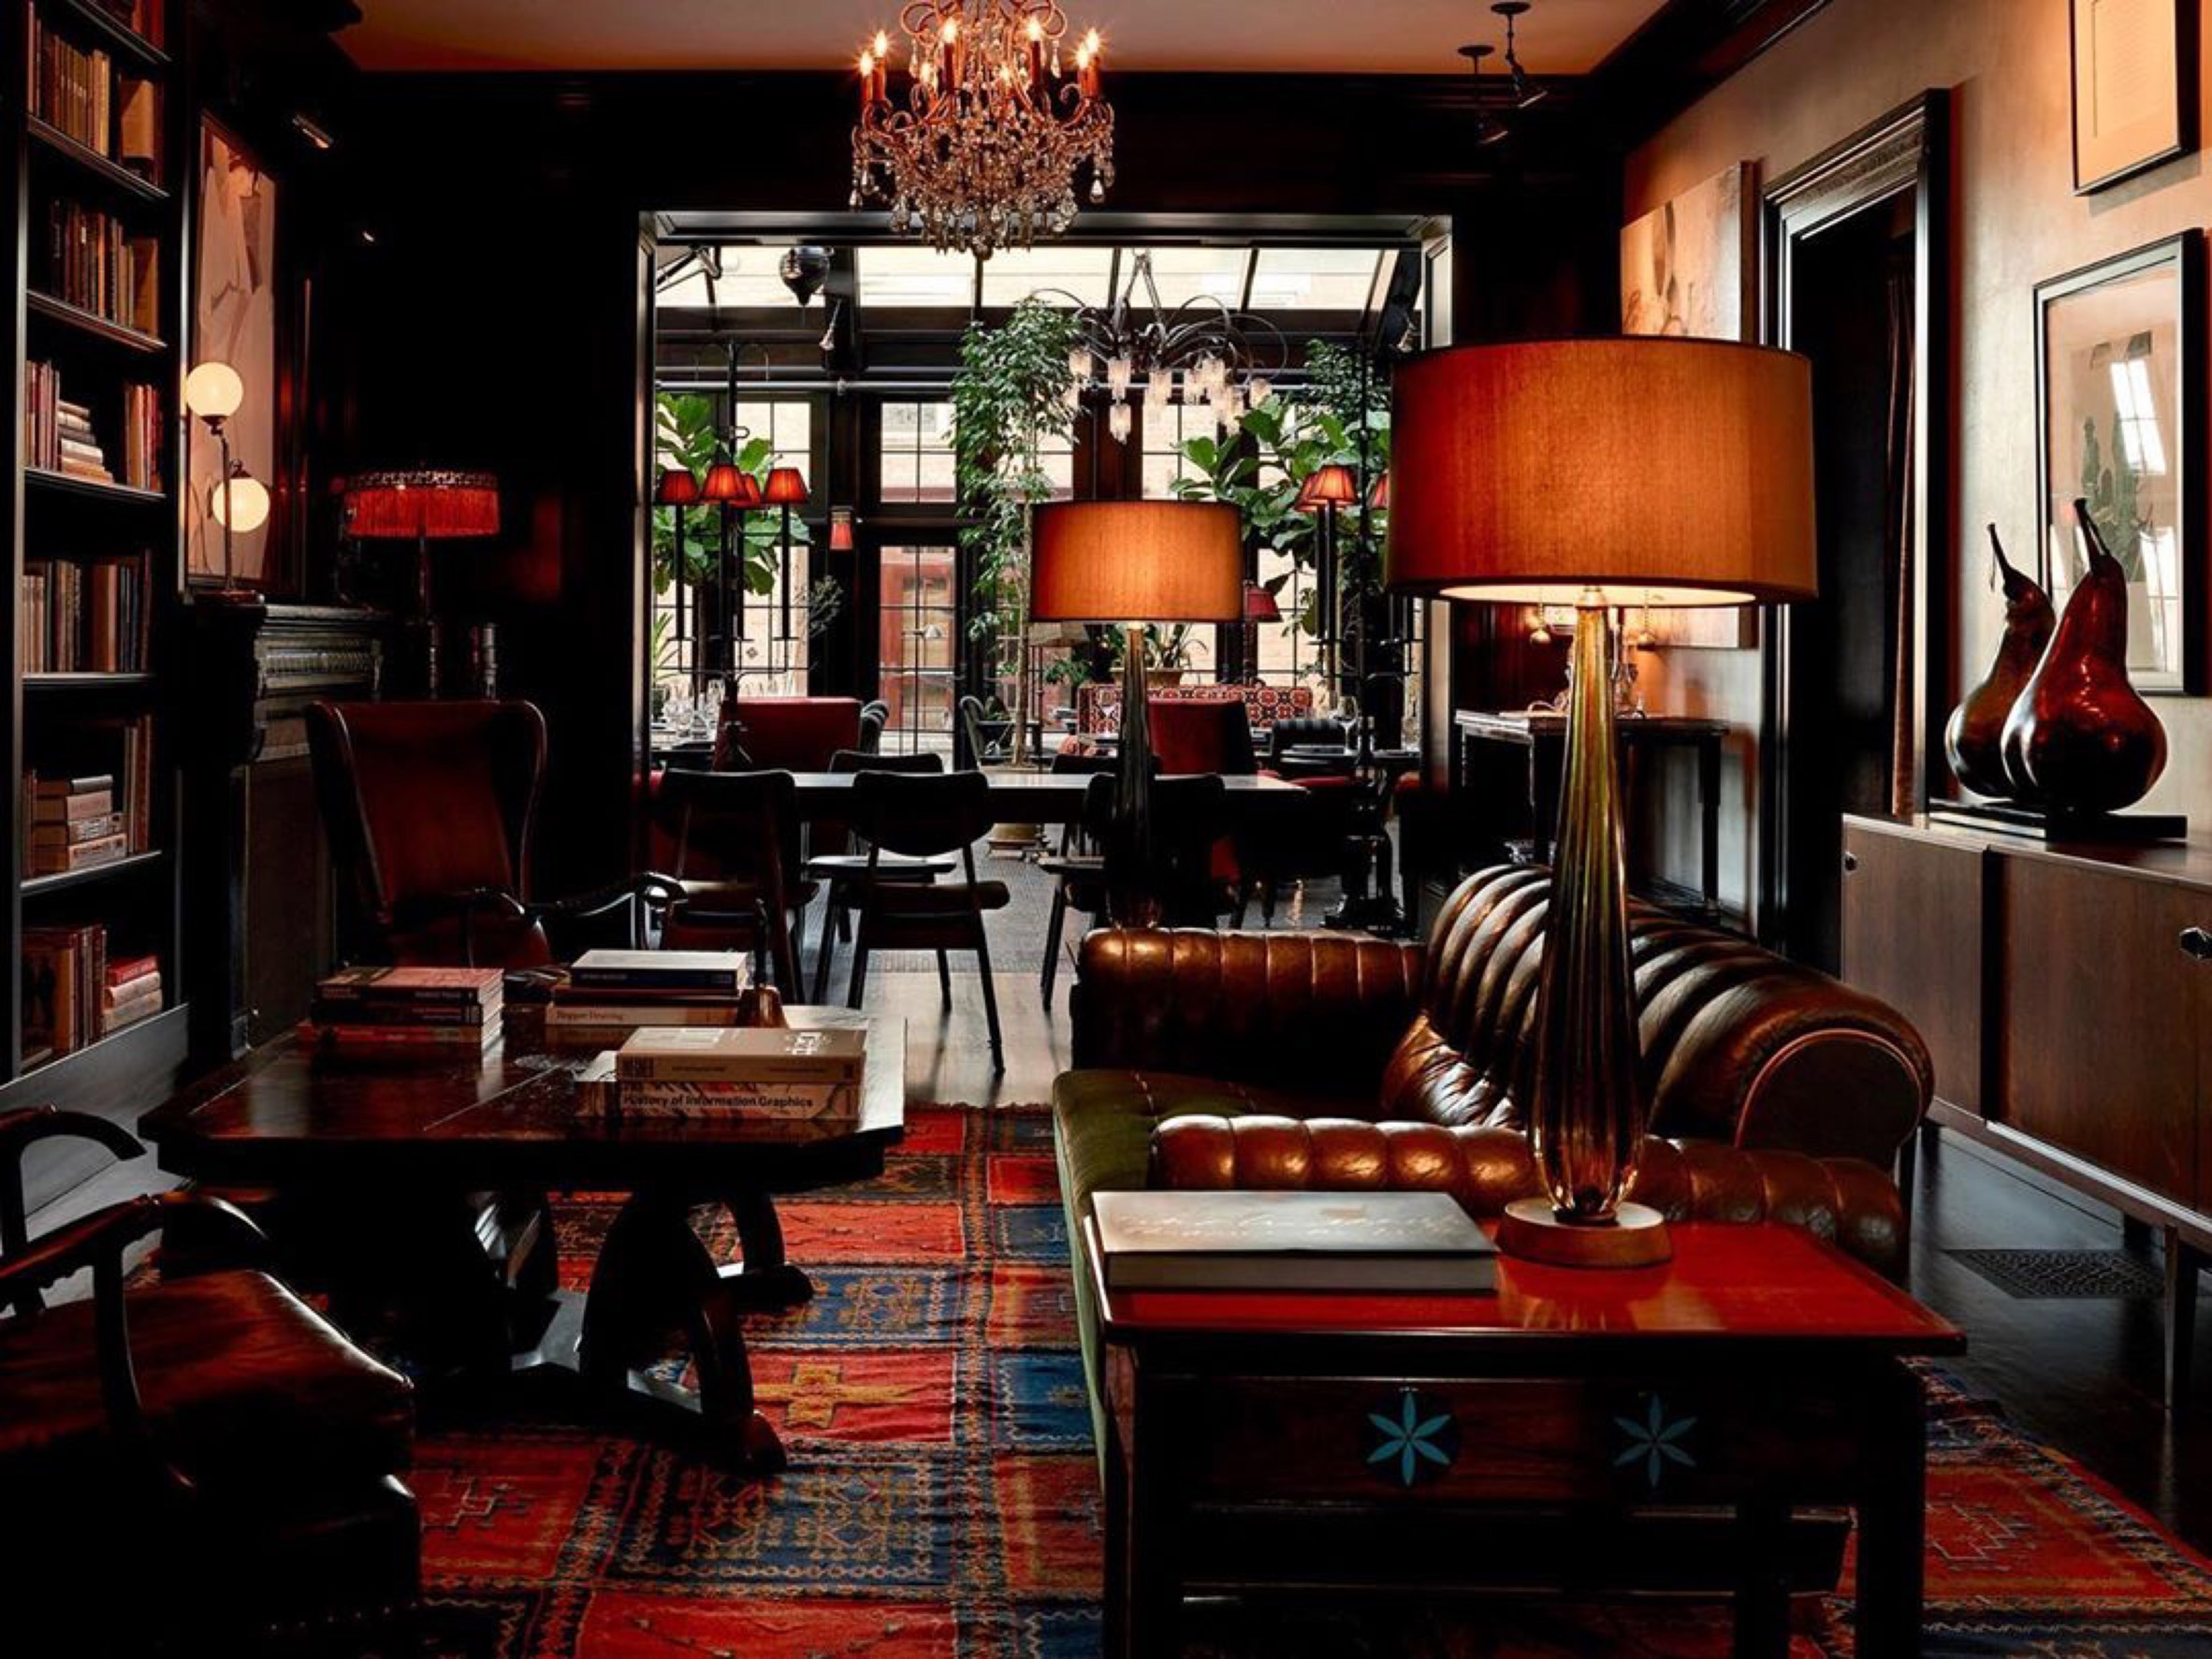 Interiors of The Maker Hotel in Hudson, New York